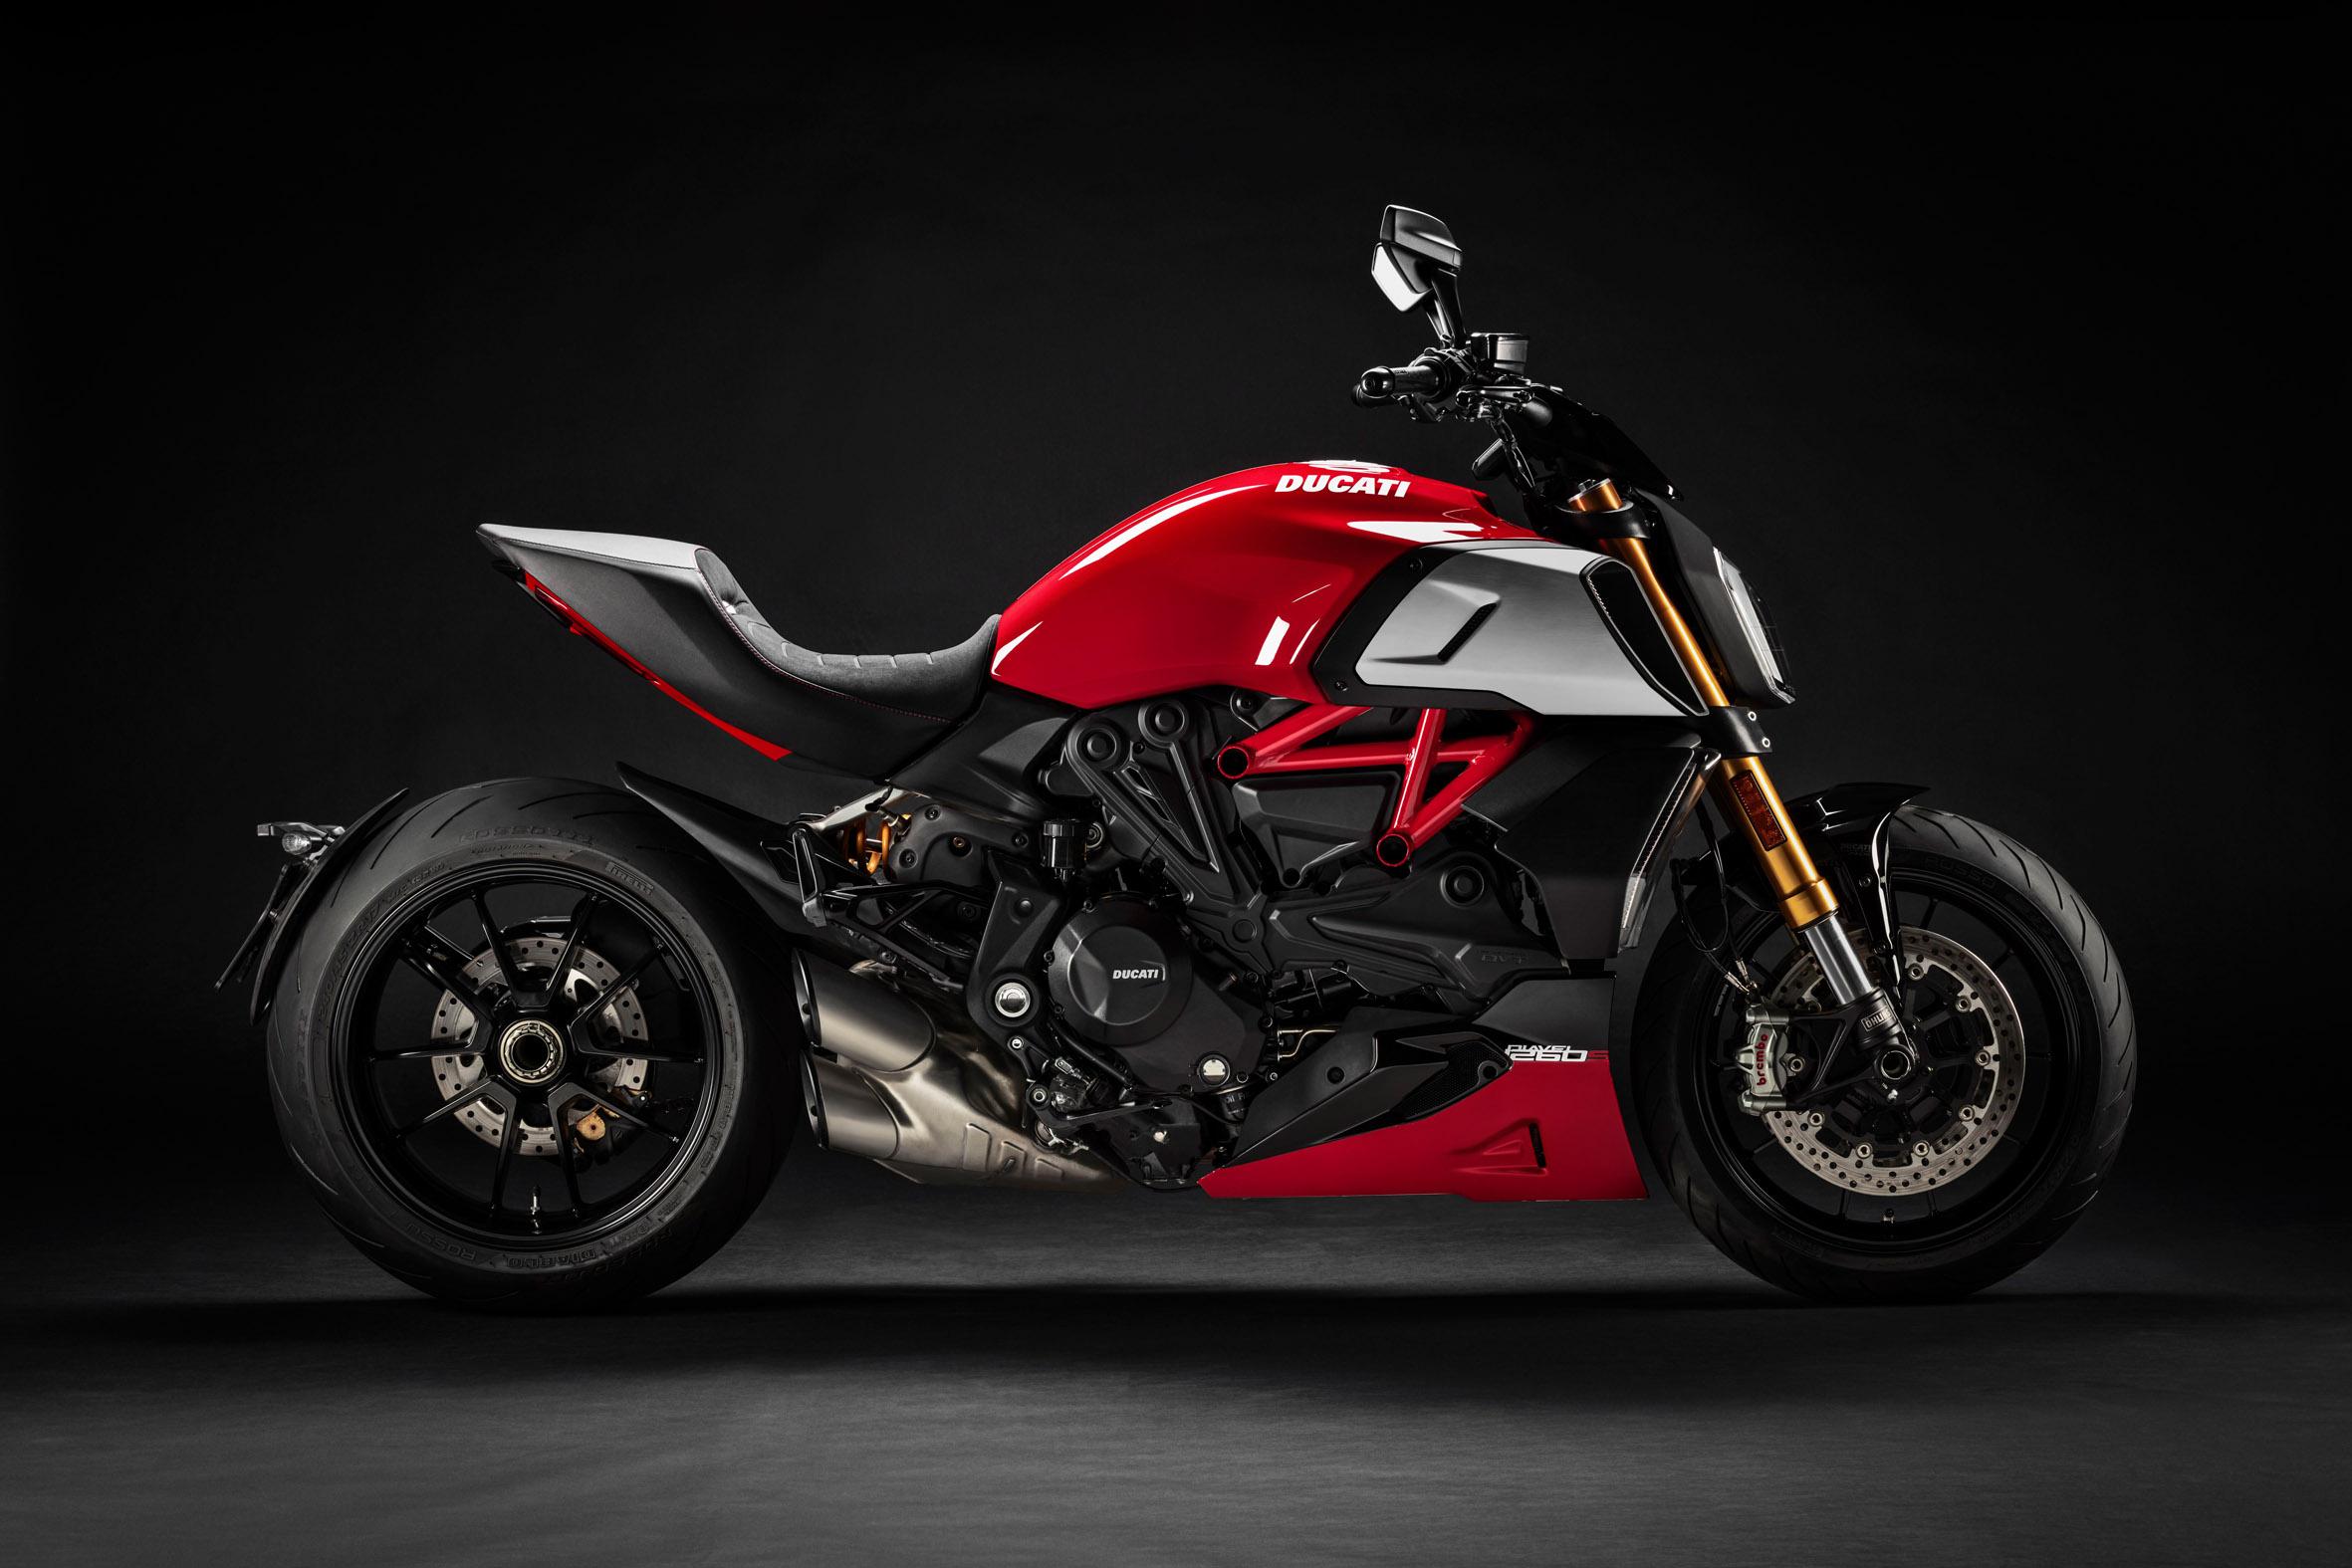 Nuevo color Ducati Diavel 1260s 2020 roja